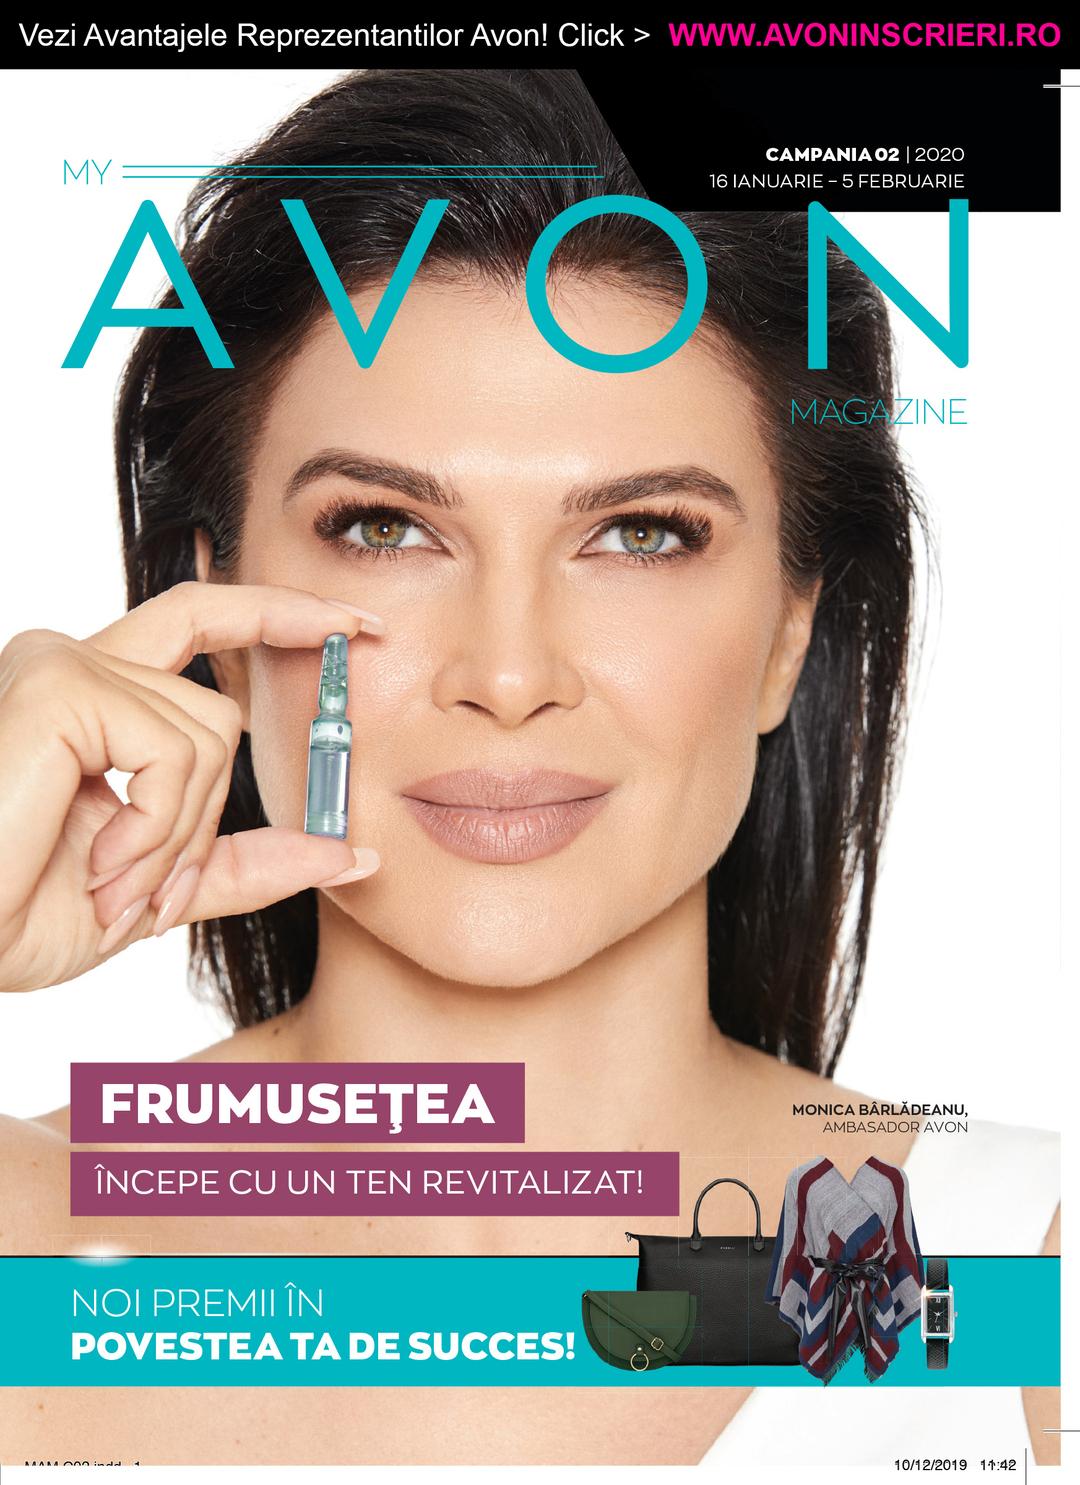 Page 1 of Revista My Avon Magazine C2 2020 - www.avoninscrieri.ro